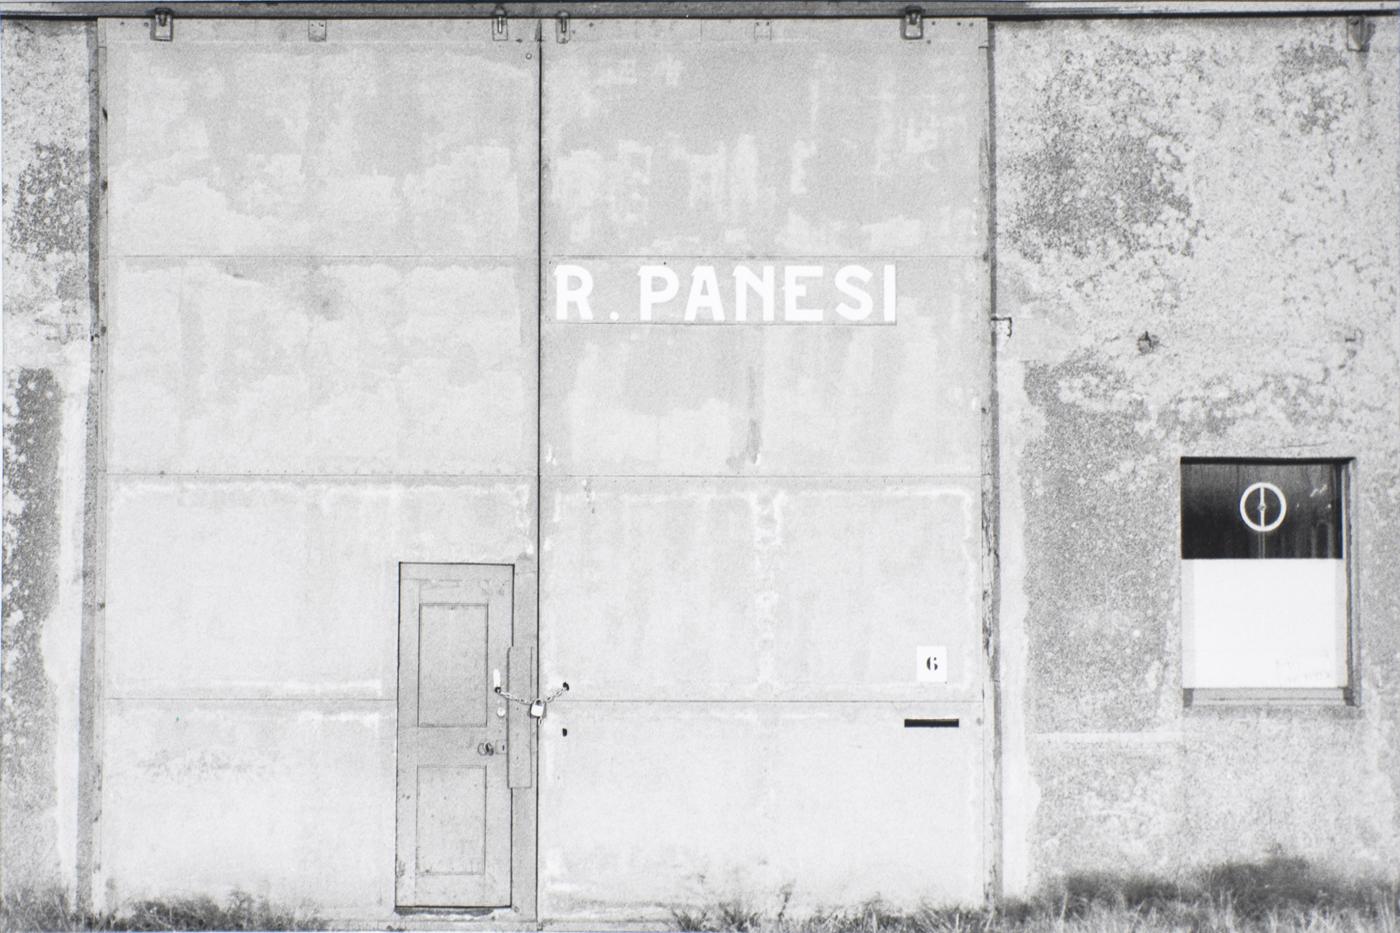 Panesi (14)